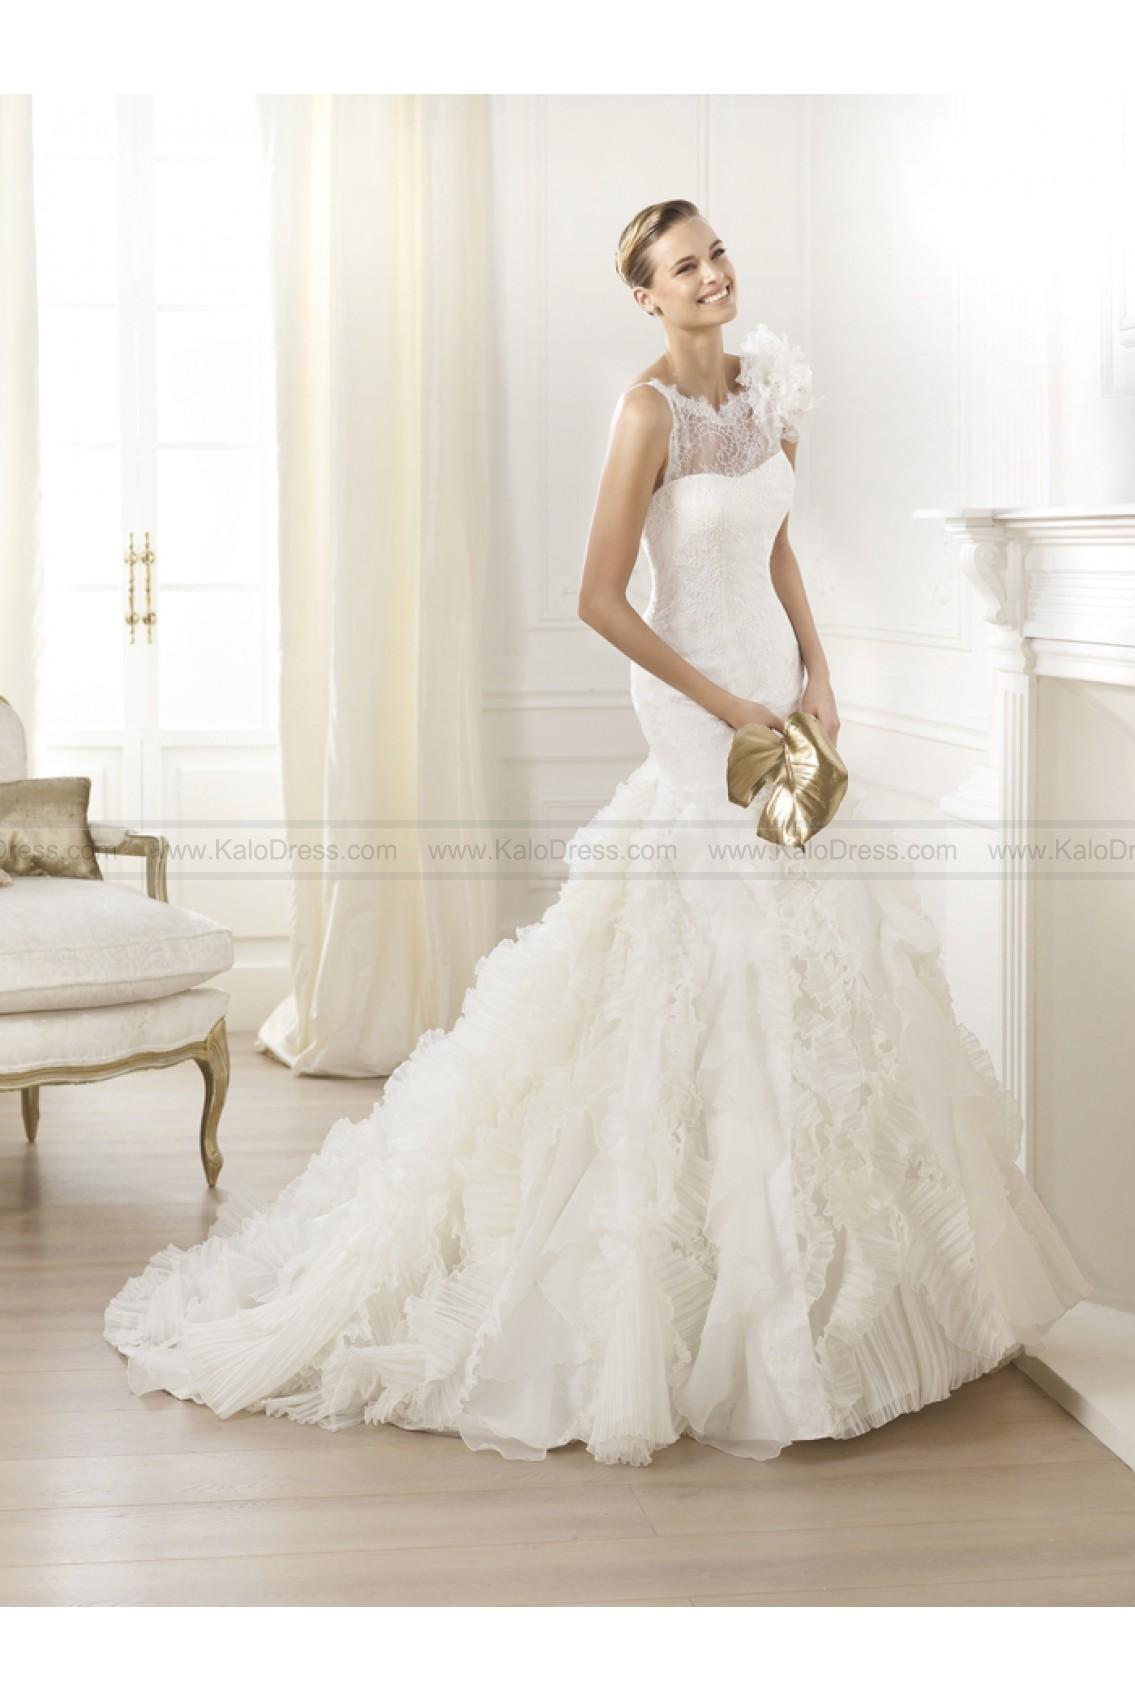 Pronovias Wedding Dresses - Style Leandra - Wedding Dresses 2014 New - Formal Wedding Dresses